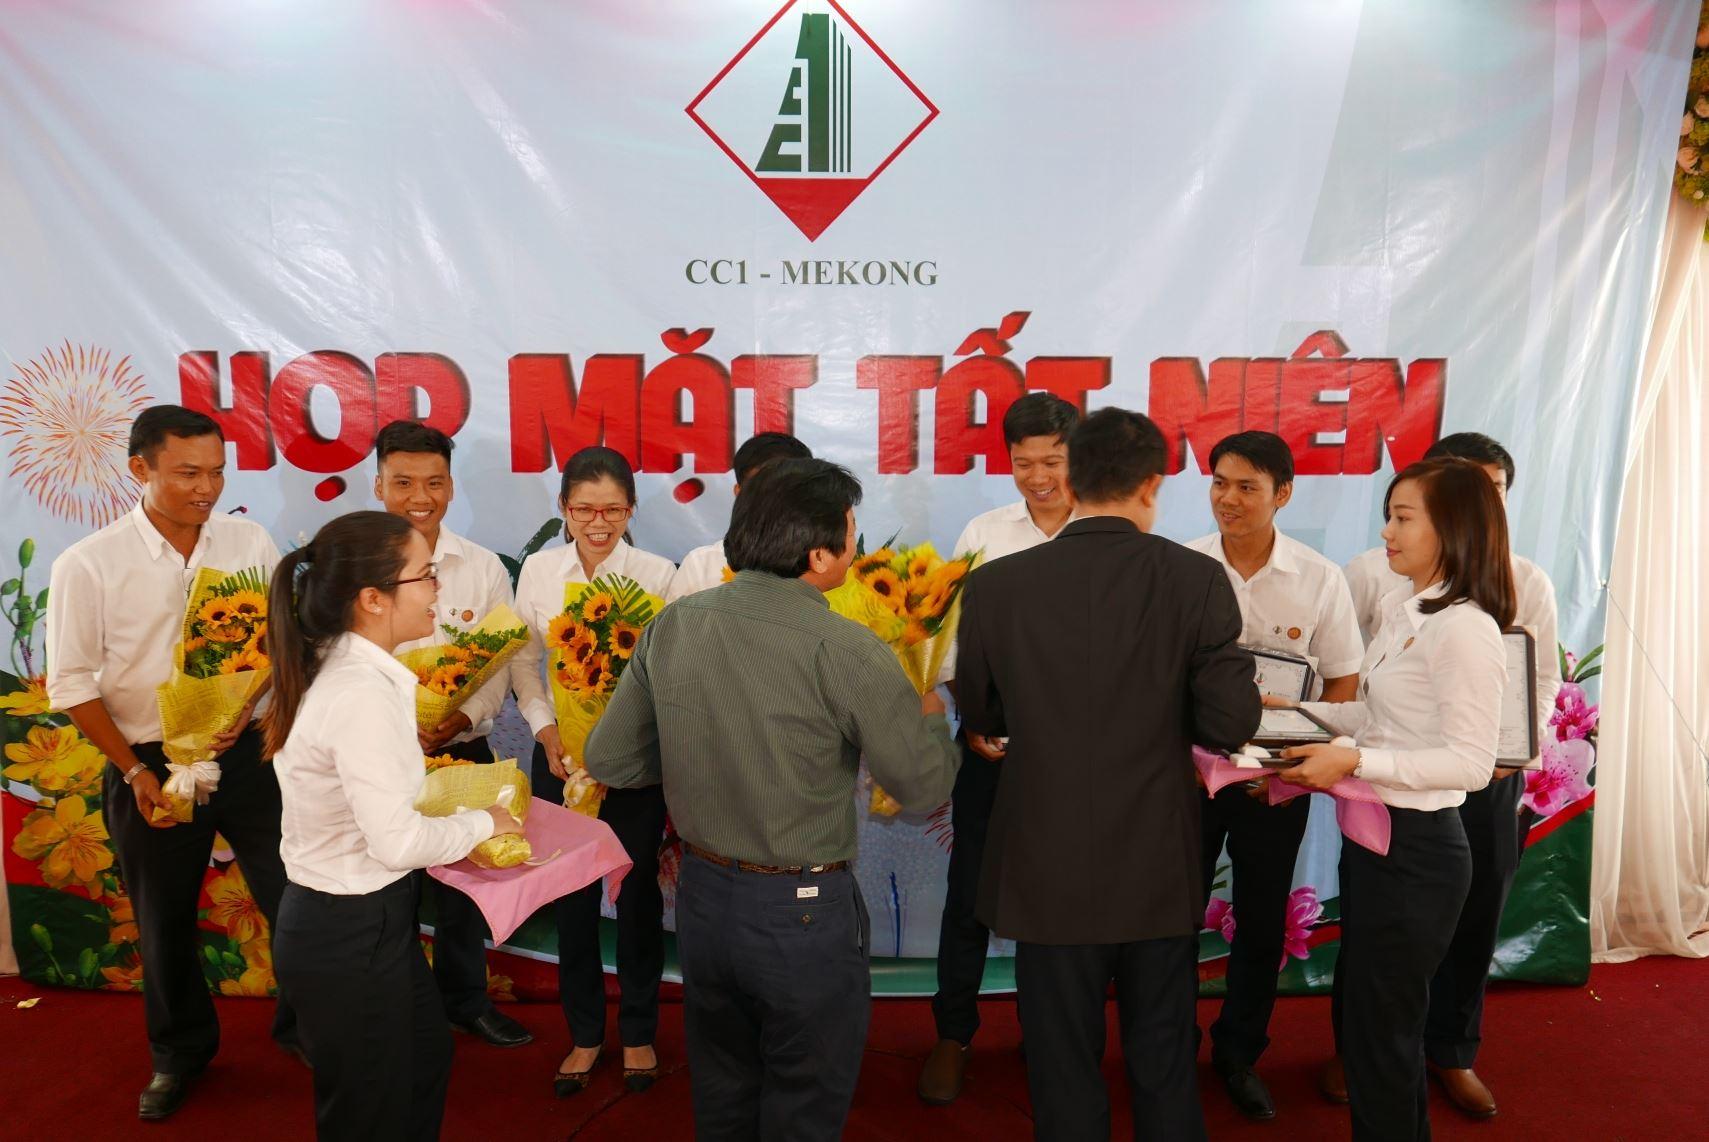 tat-nien-2019-cc1-mekong (15)